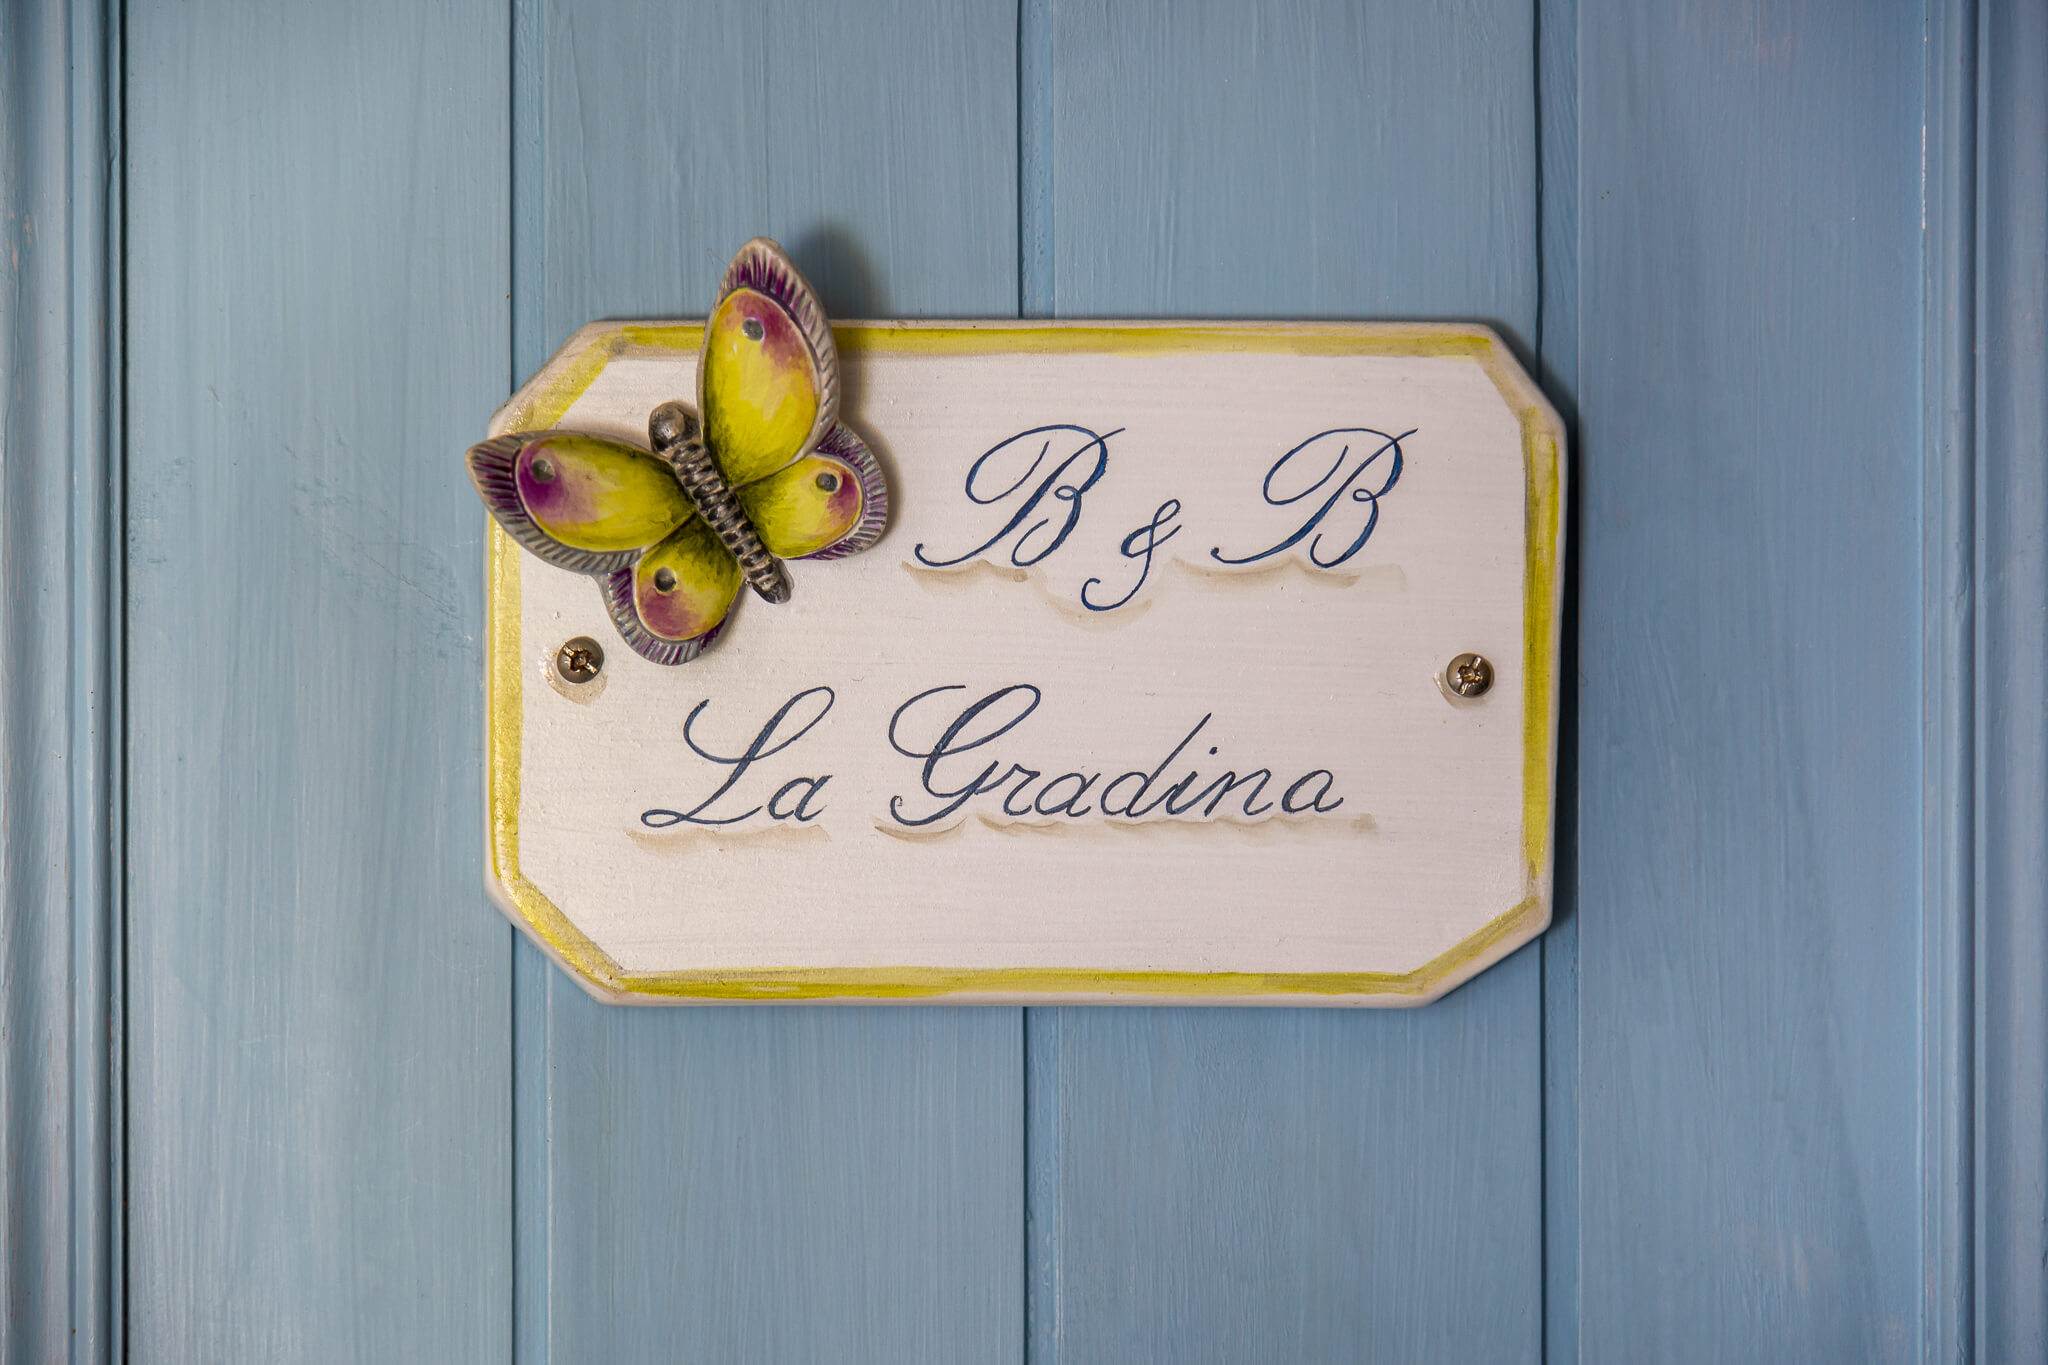 La gradina - Bed and breakfast